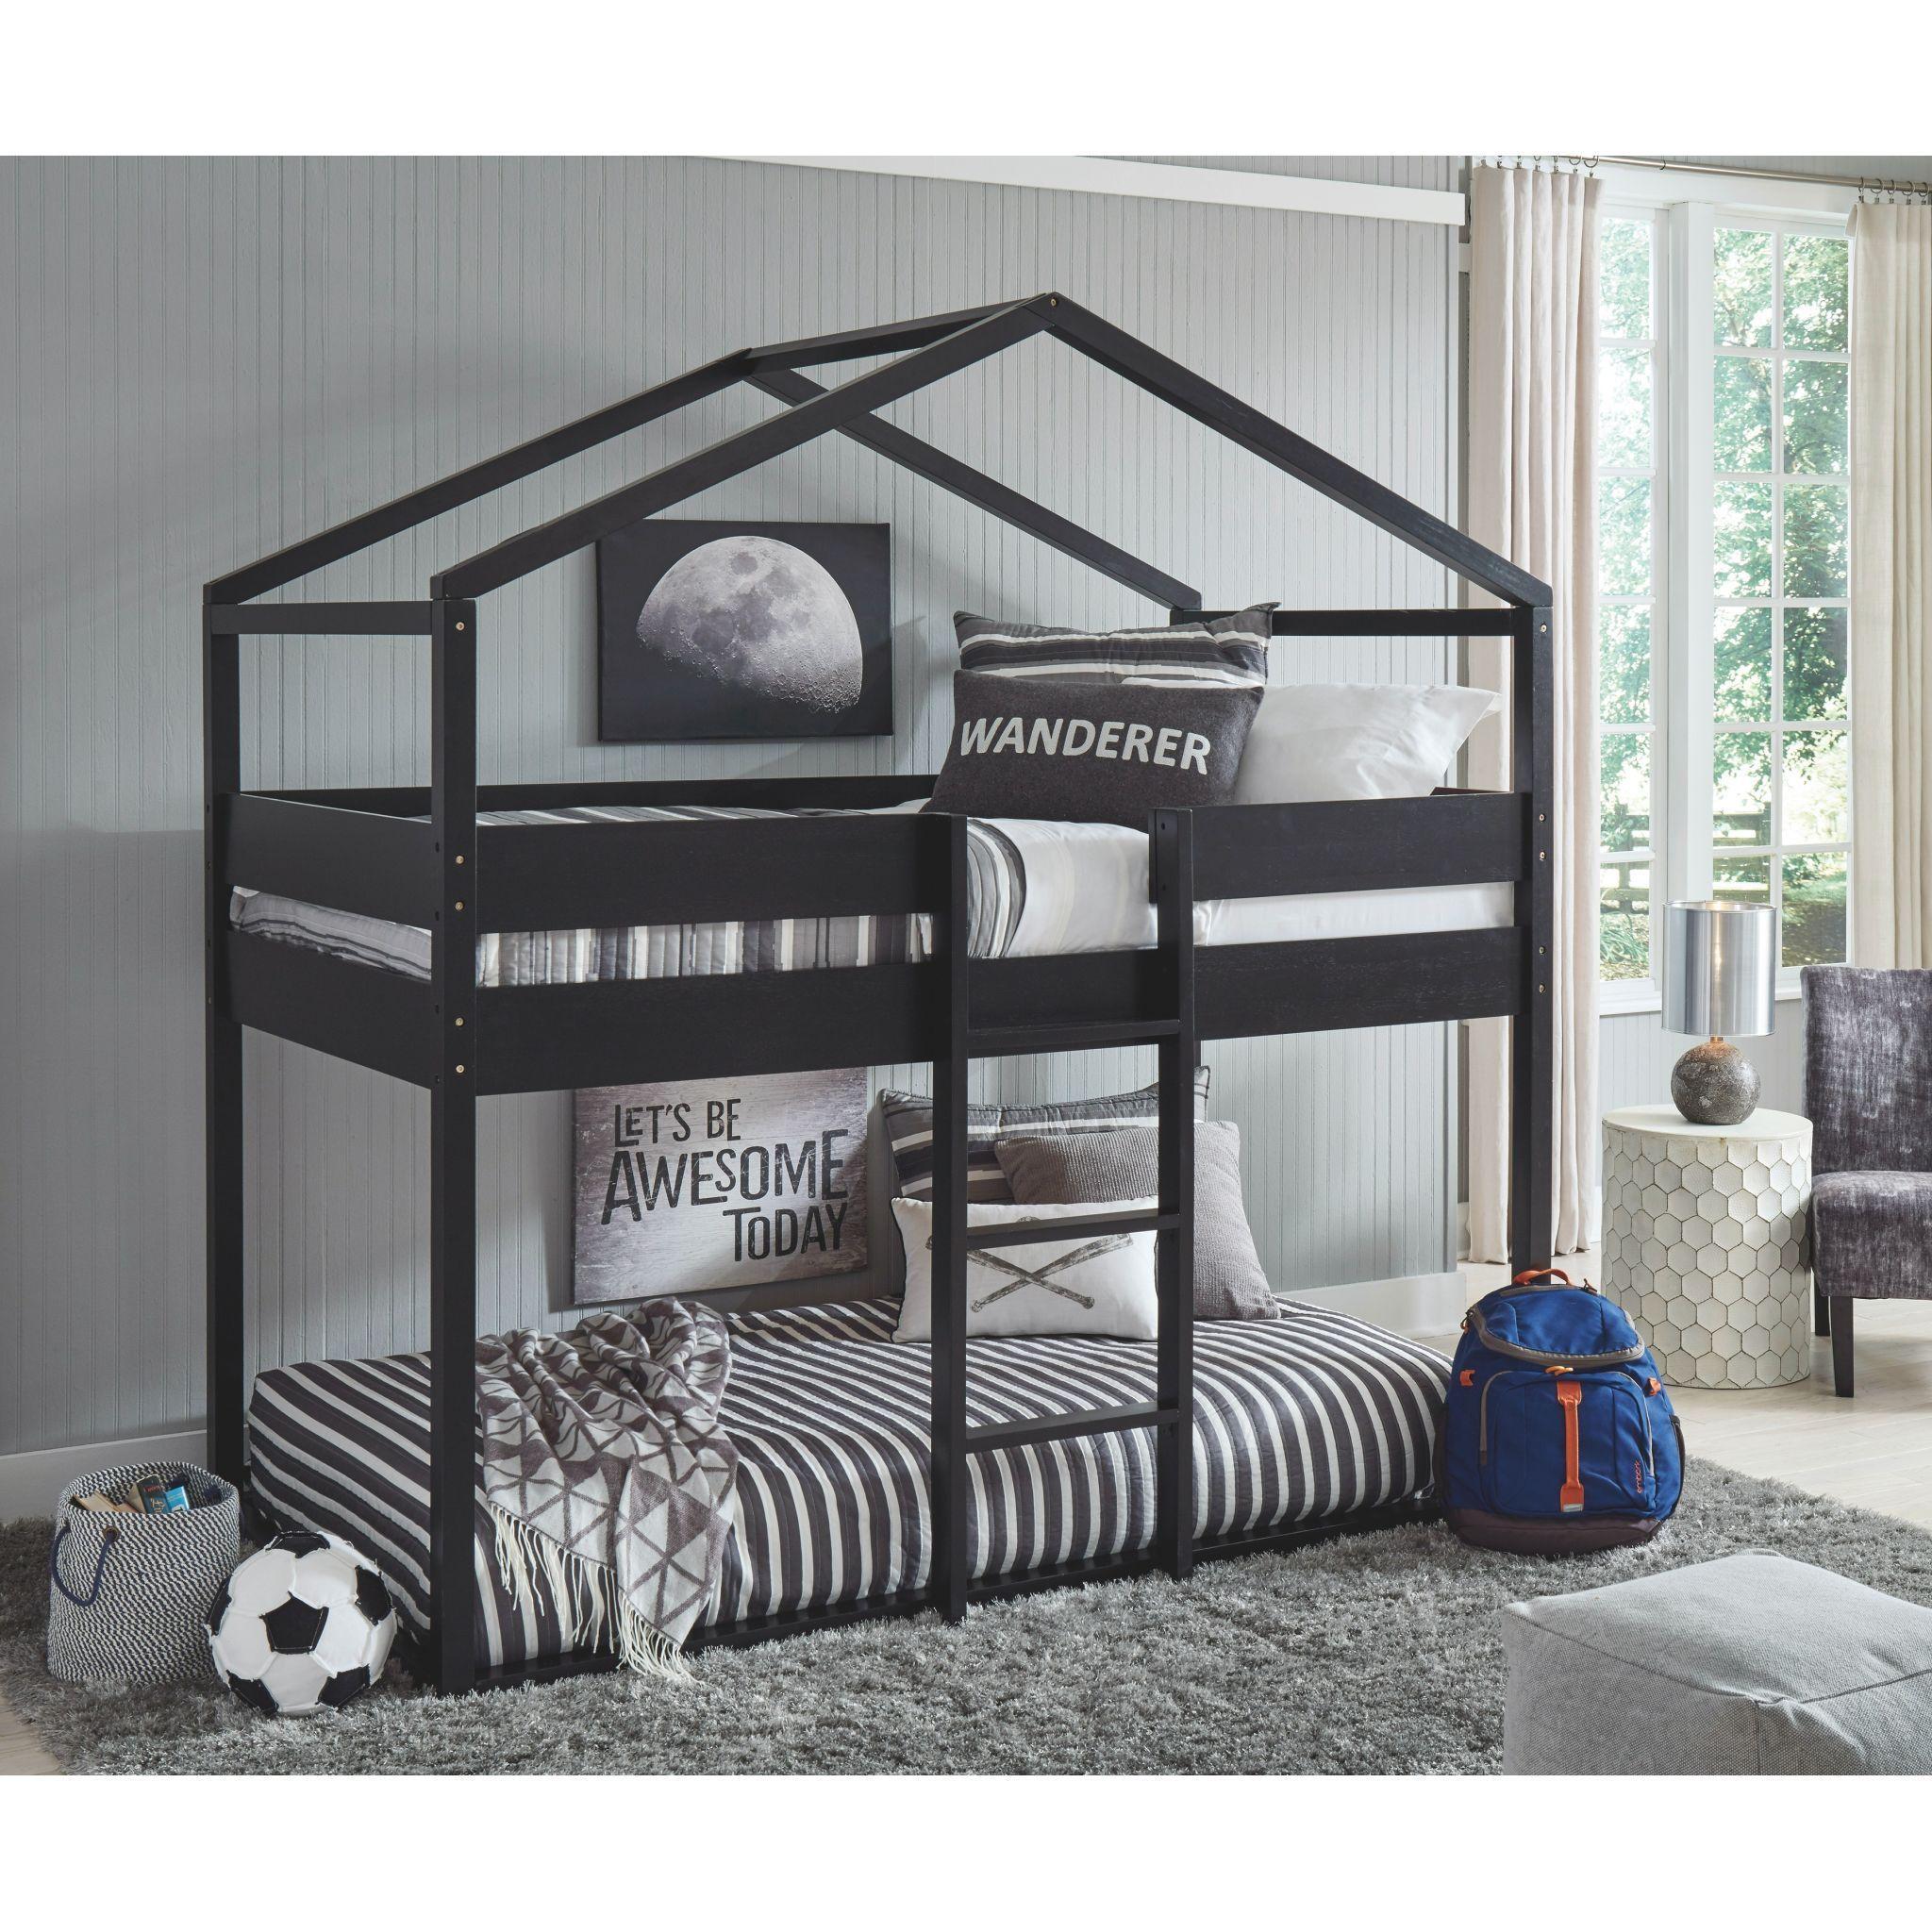 Flannibrook Tt House Loft Bed House Frame Bed House Bunk Bed Loft Bed [ 2048 x 2048 Pixel ]